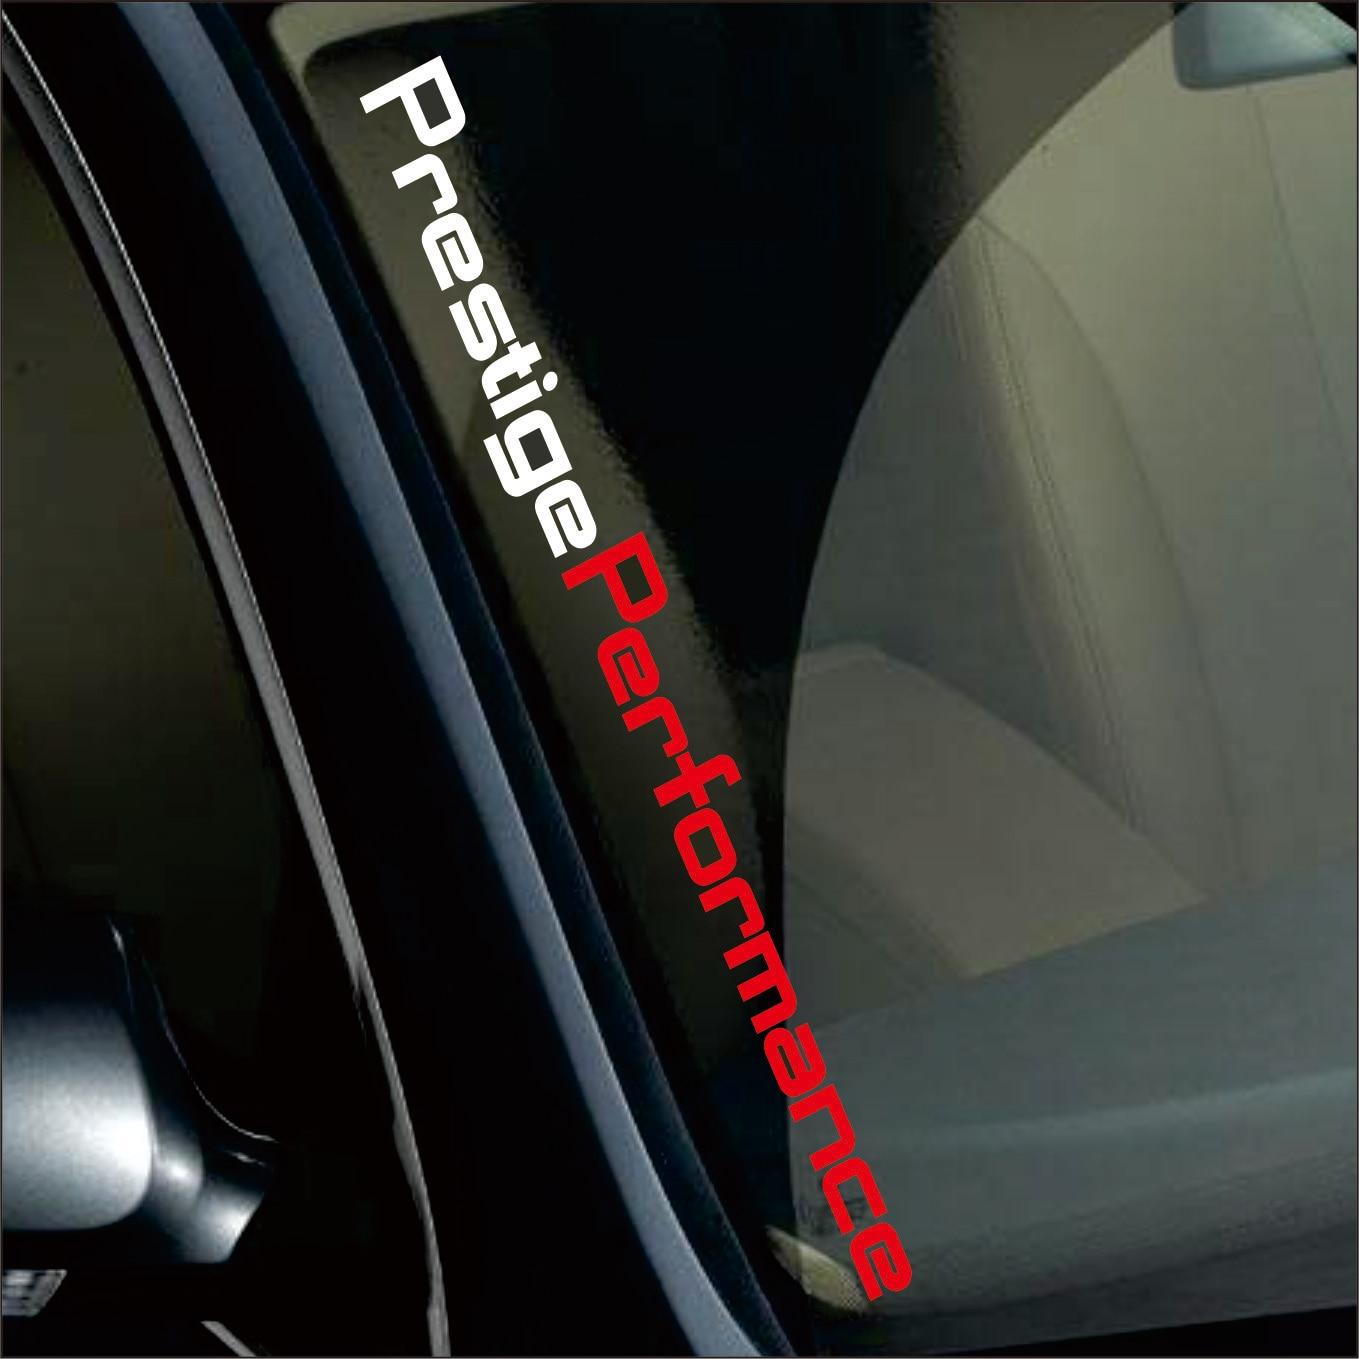 55 x 6CM Red/White Prestige Performance Graphic Front Windshield Decor Stickers Auto Door Customized Car Body Sticker Lebal